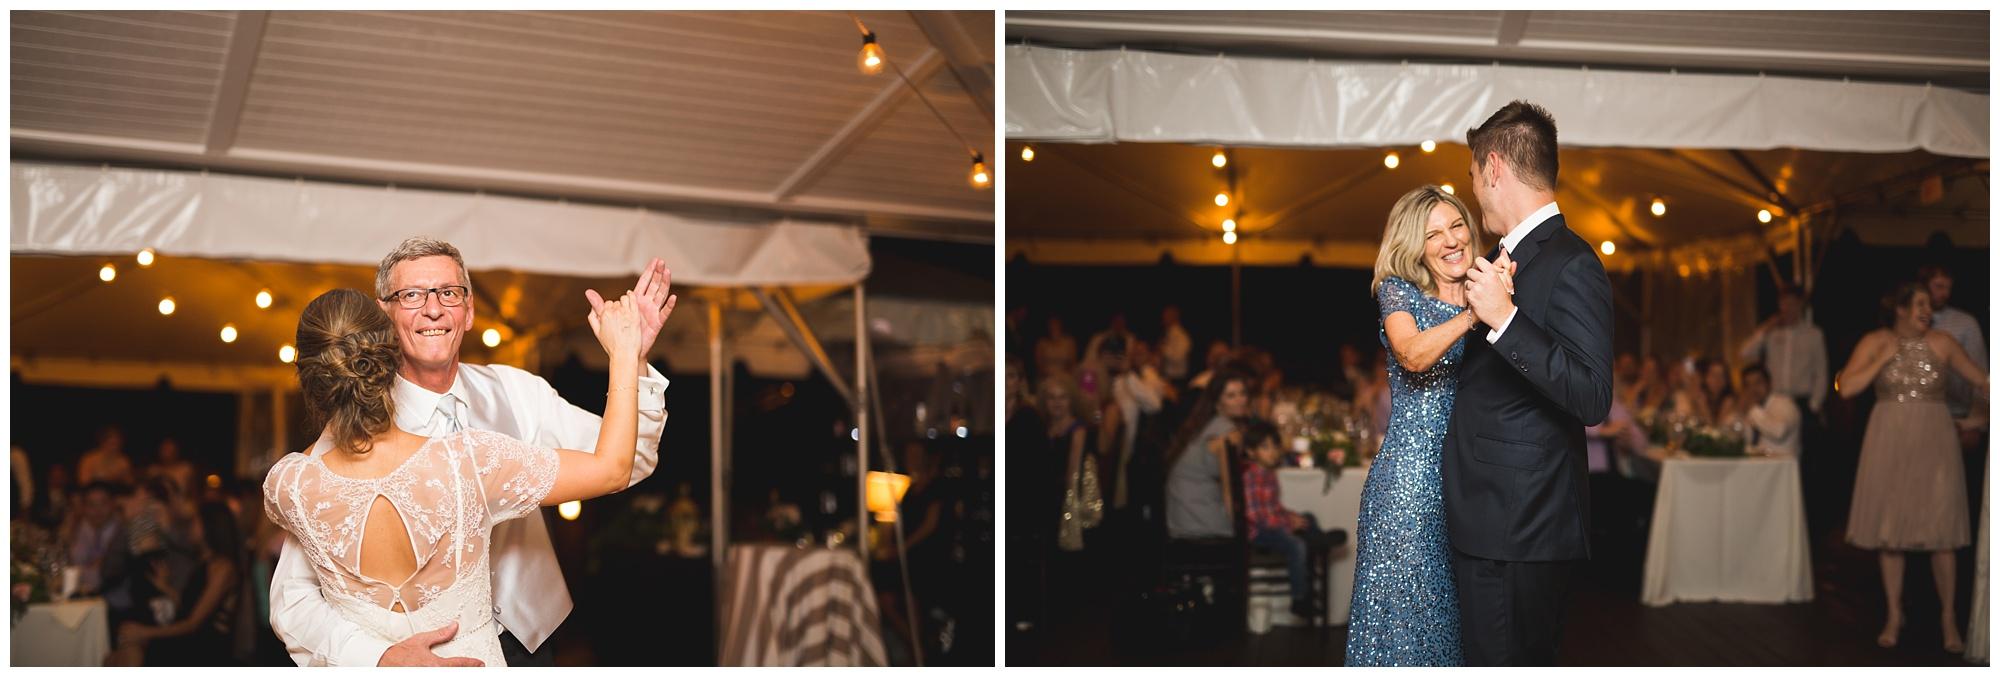 raleigh-wedding-photography-3.jpg